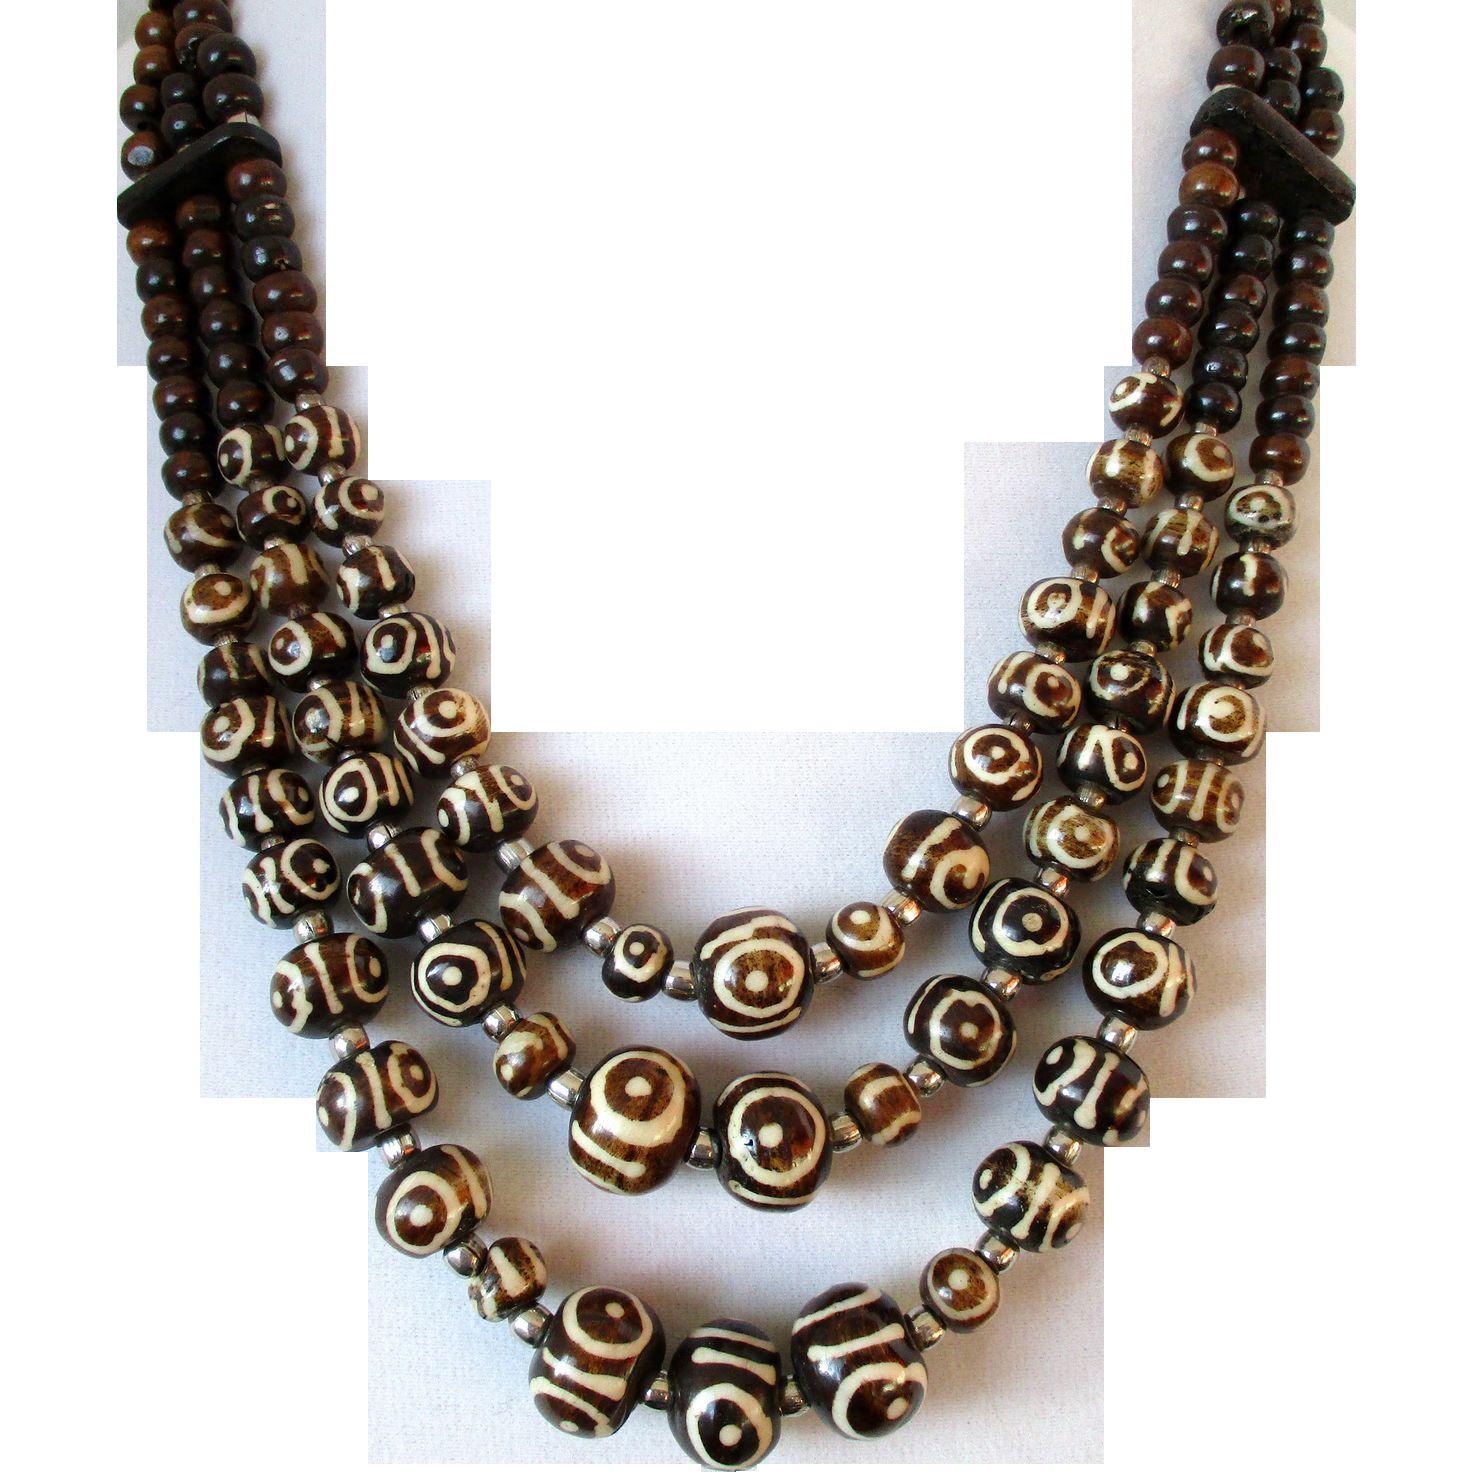 Brown and Cream Batik Bone Beaded Ethnic 3 Strand Necklace Vintage